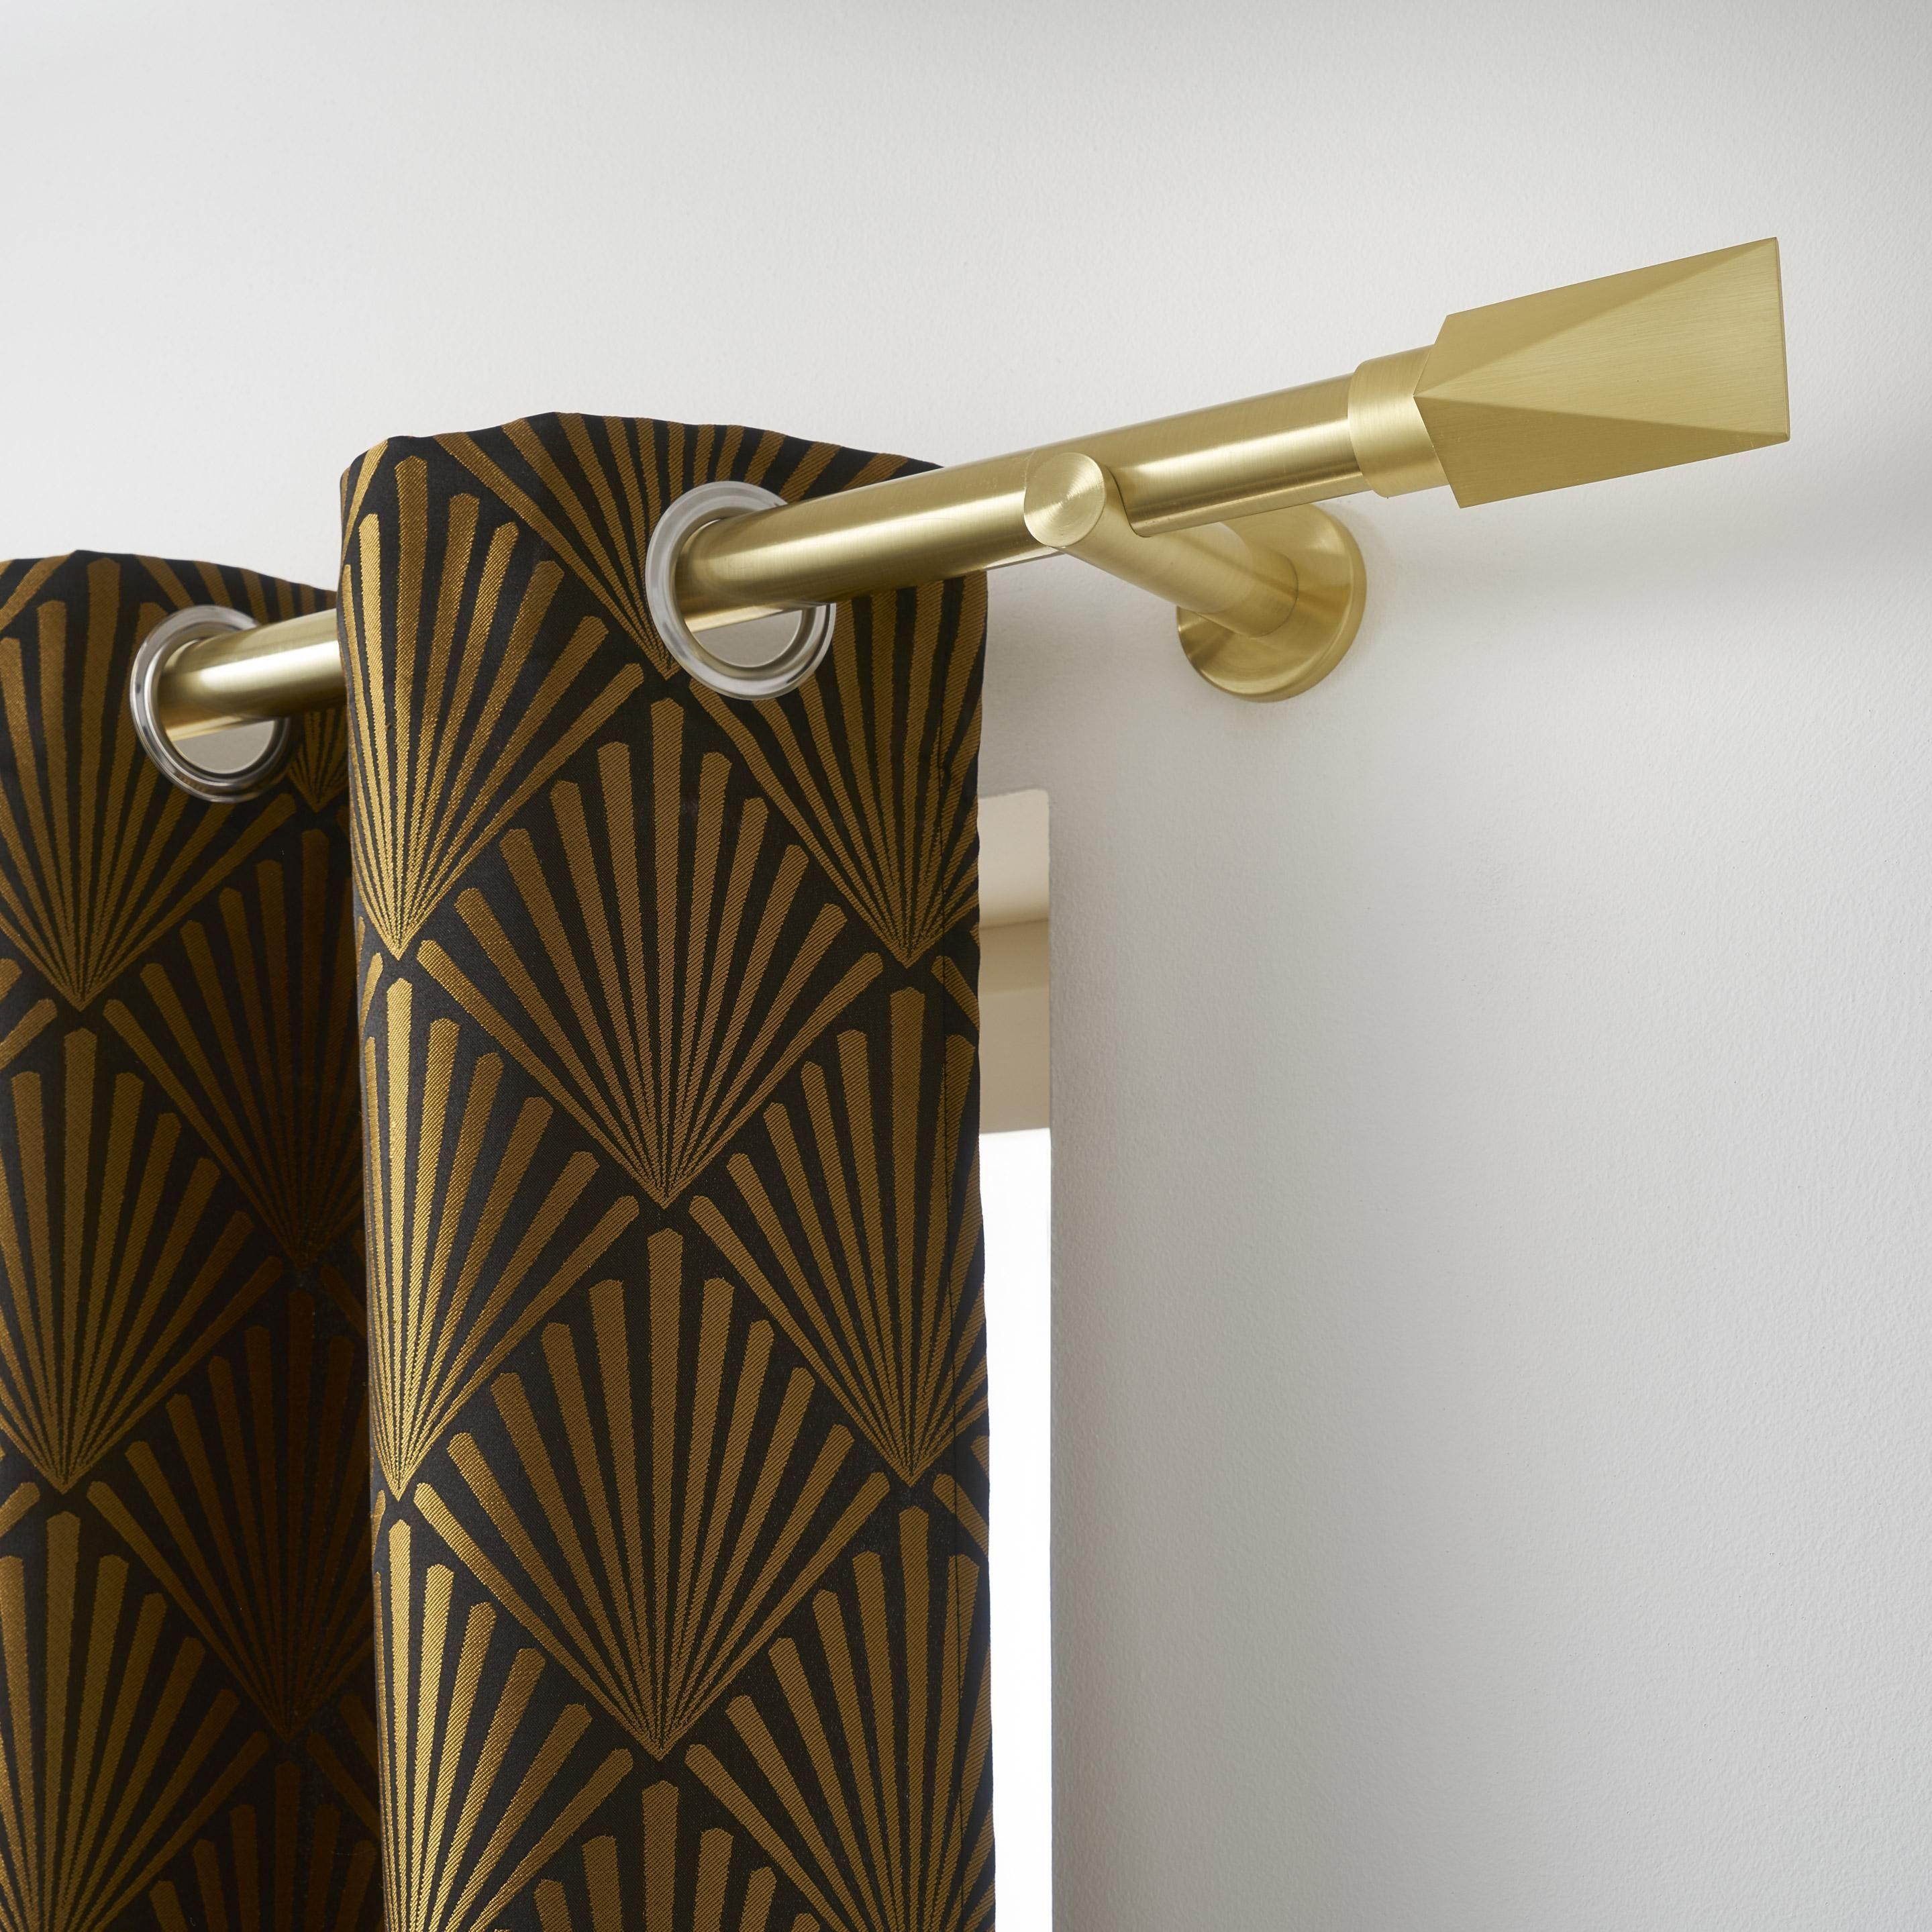 Tringle A Rideau Chic Dore Mat 150 Cm Inspire Tringle A Rideau Chic Dore Mat 150 Cm Inspire 3d Printing Diy Wall Lights Diy